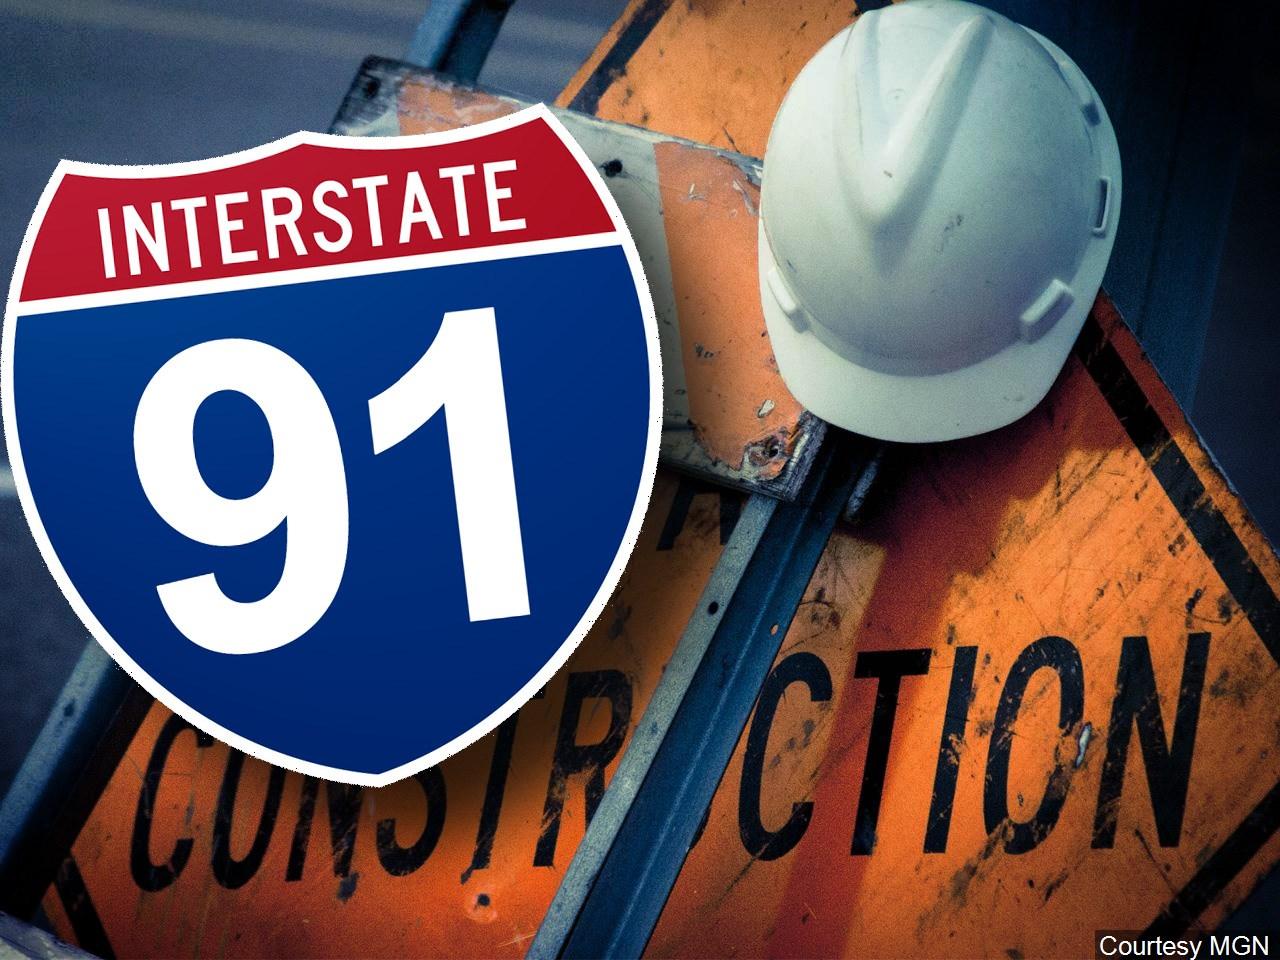 interstate 91 construction.jpg